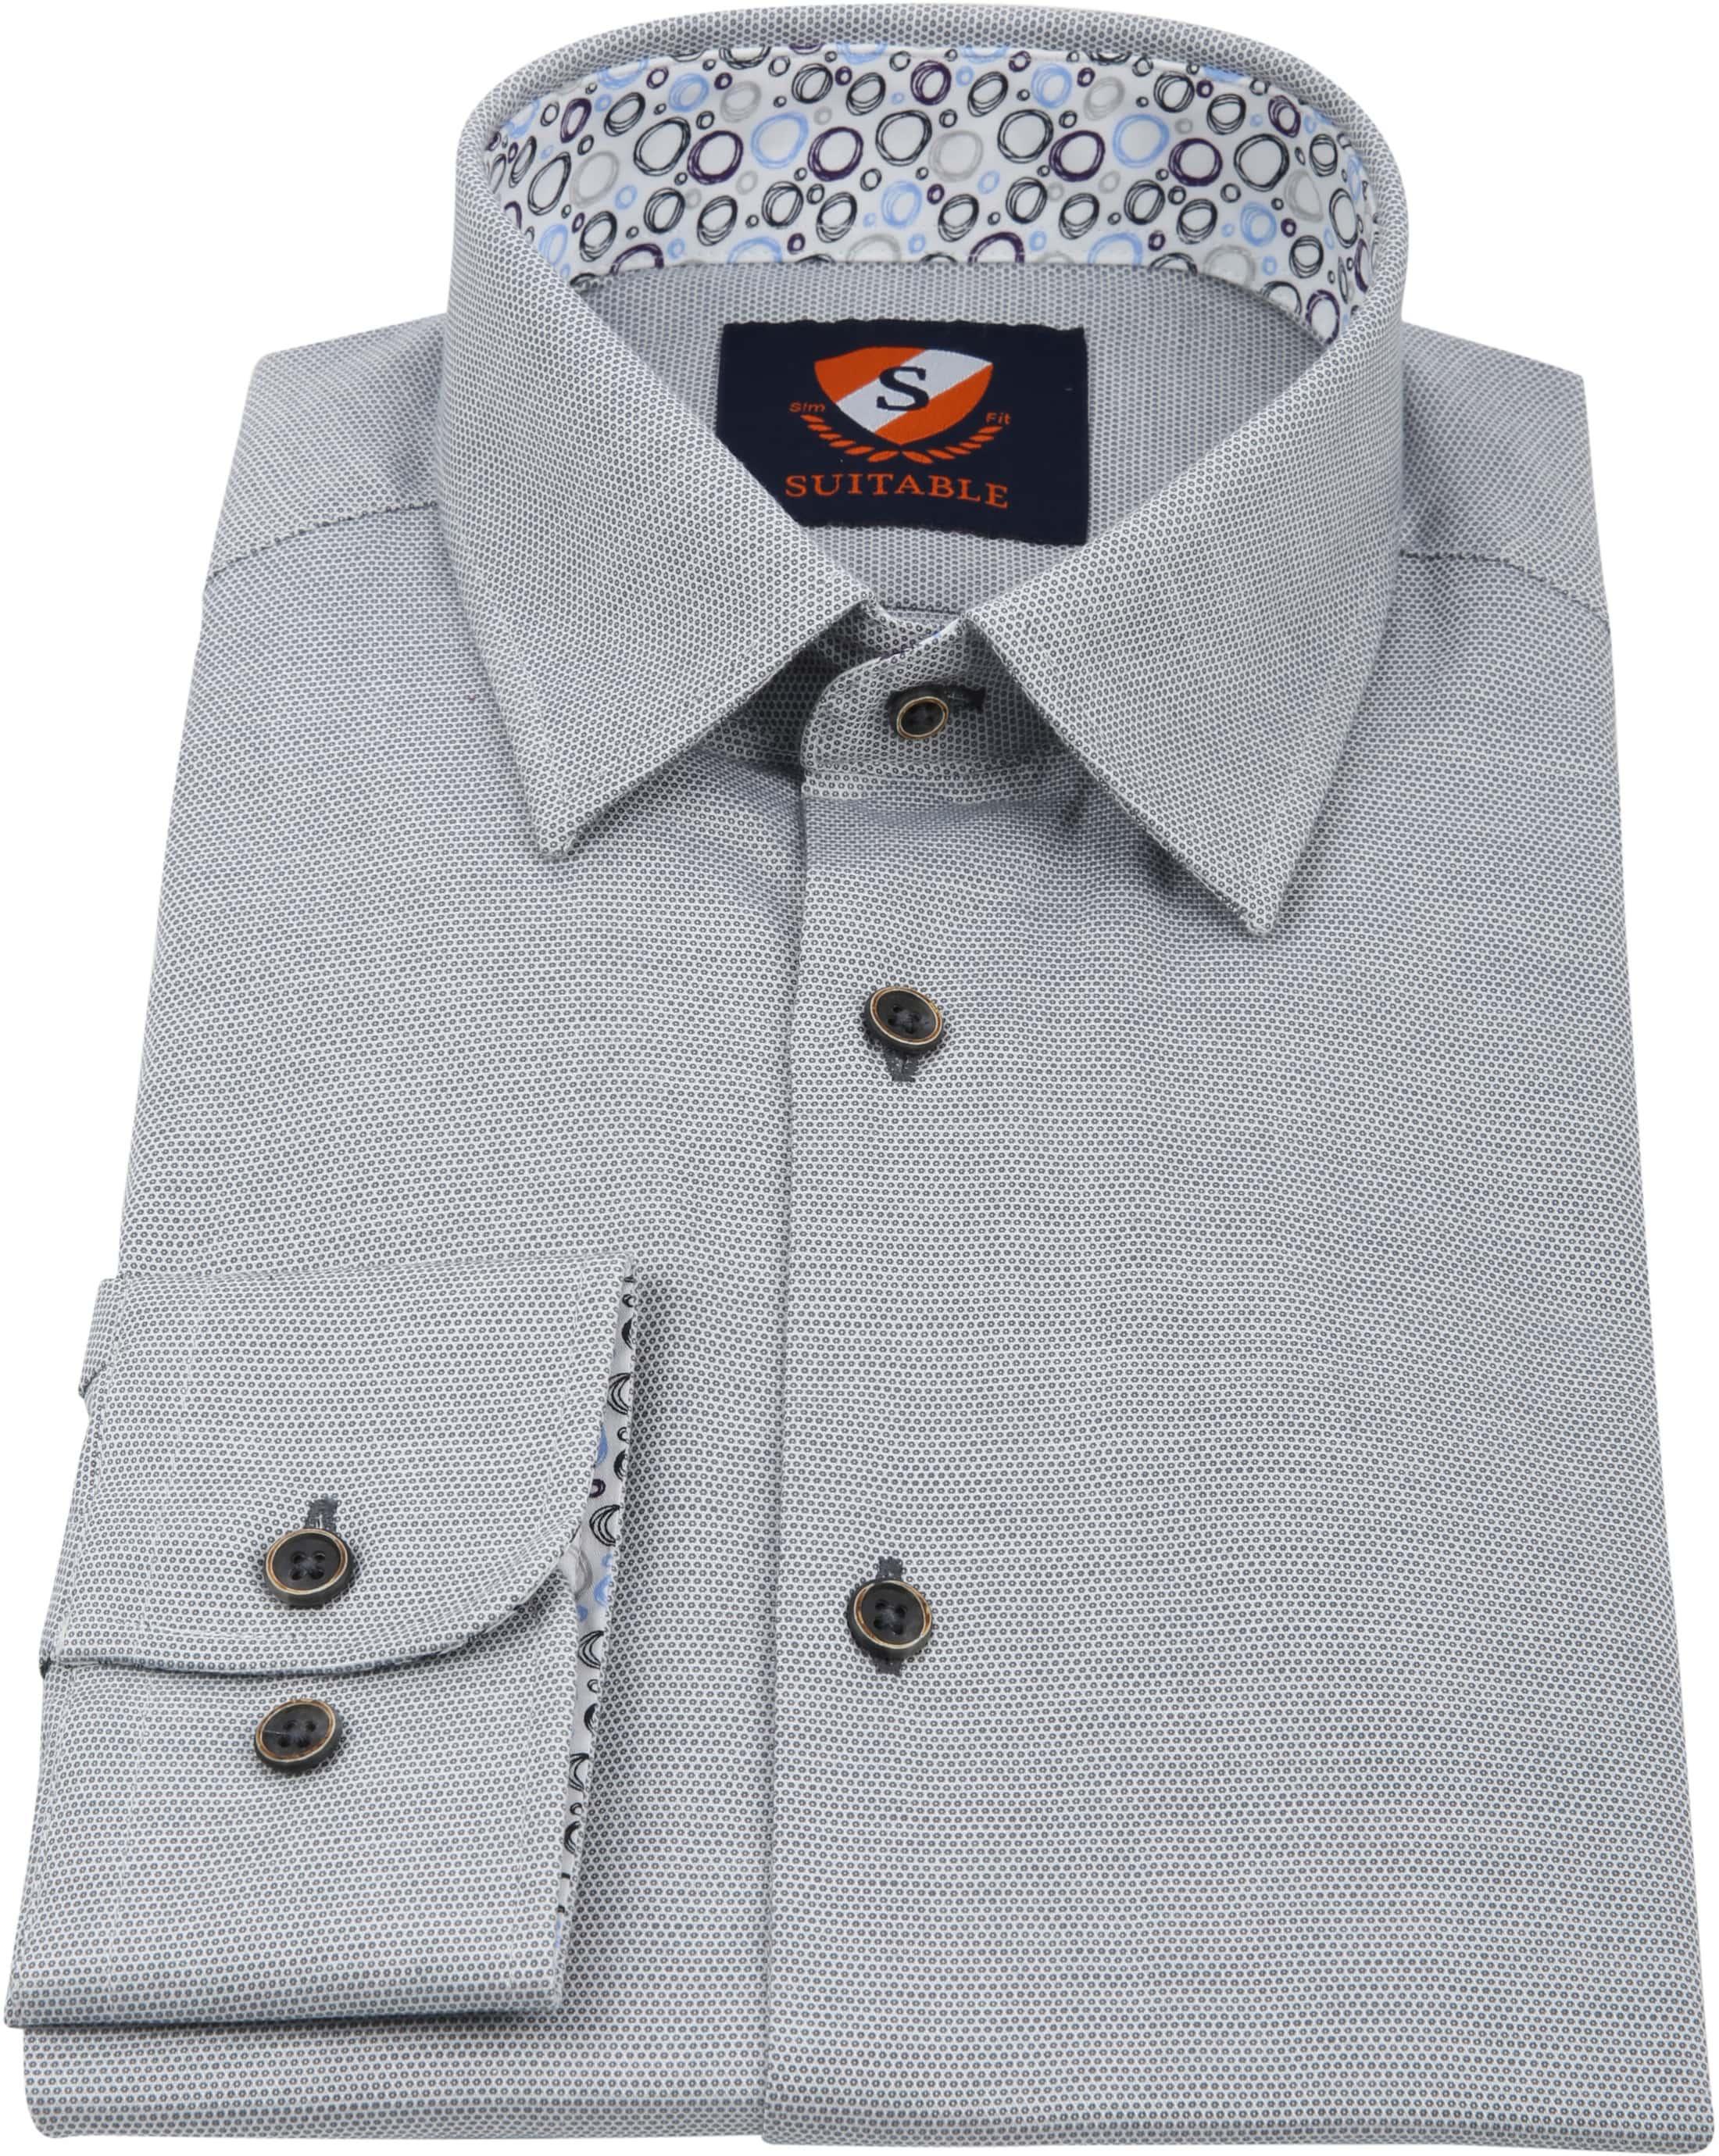 Suitable Shirt HBD Wesley Grey foto 2